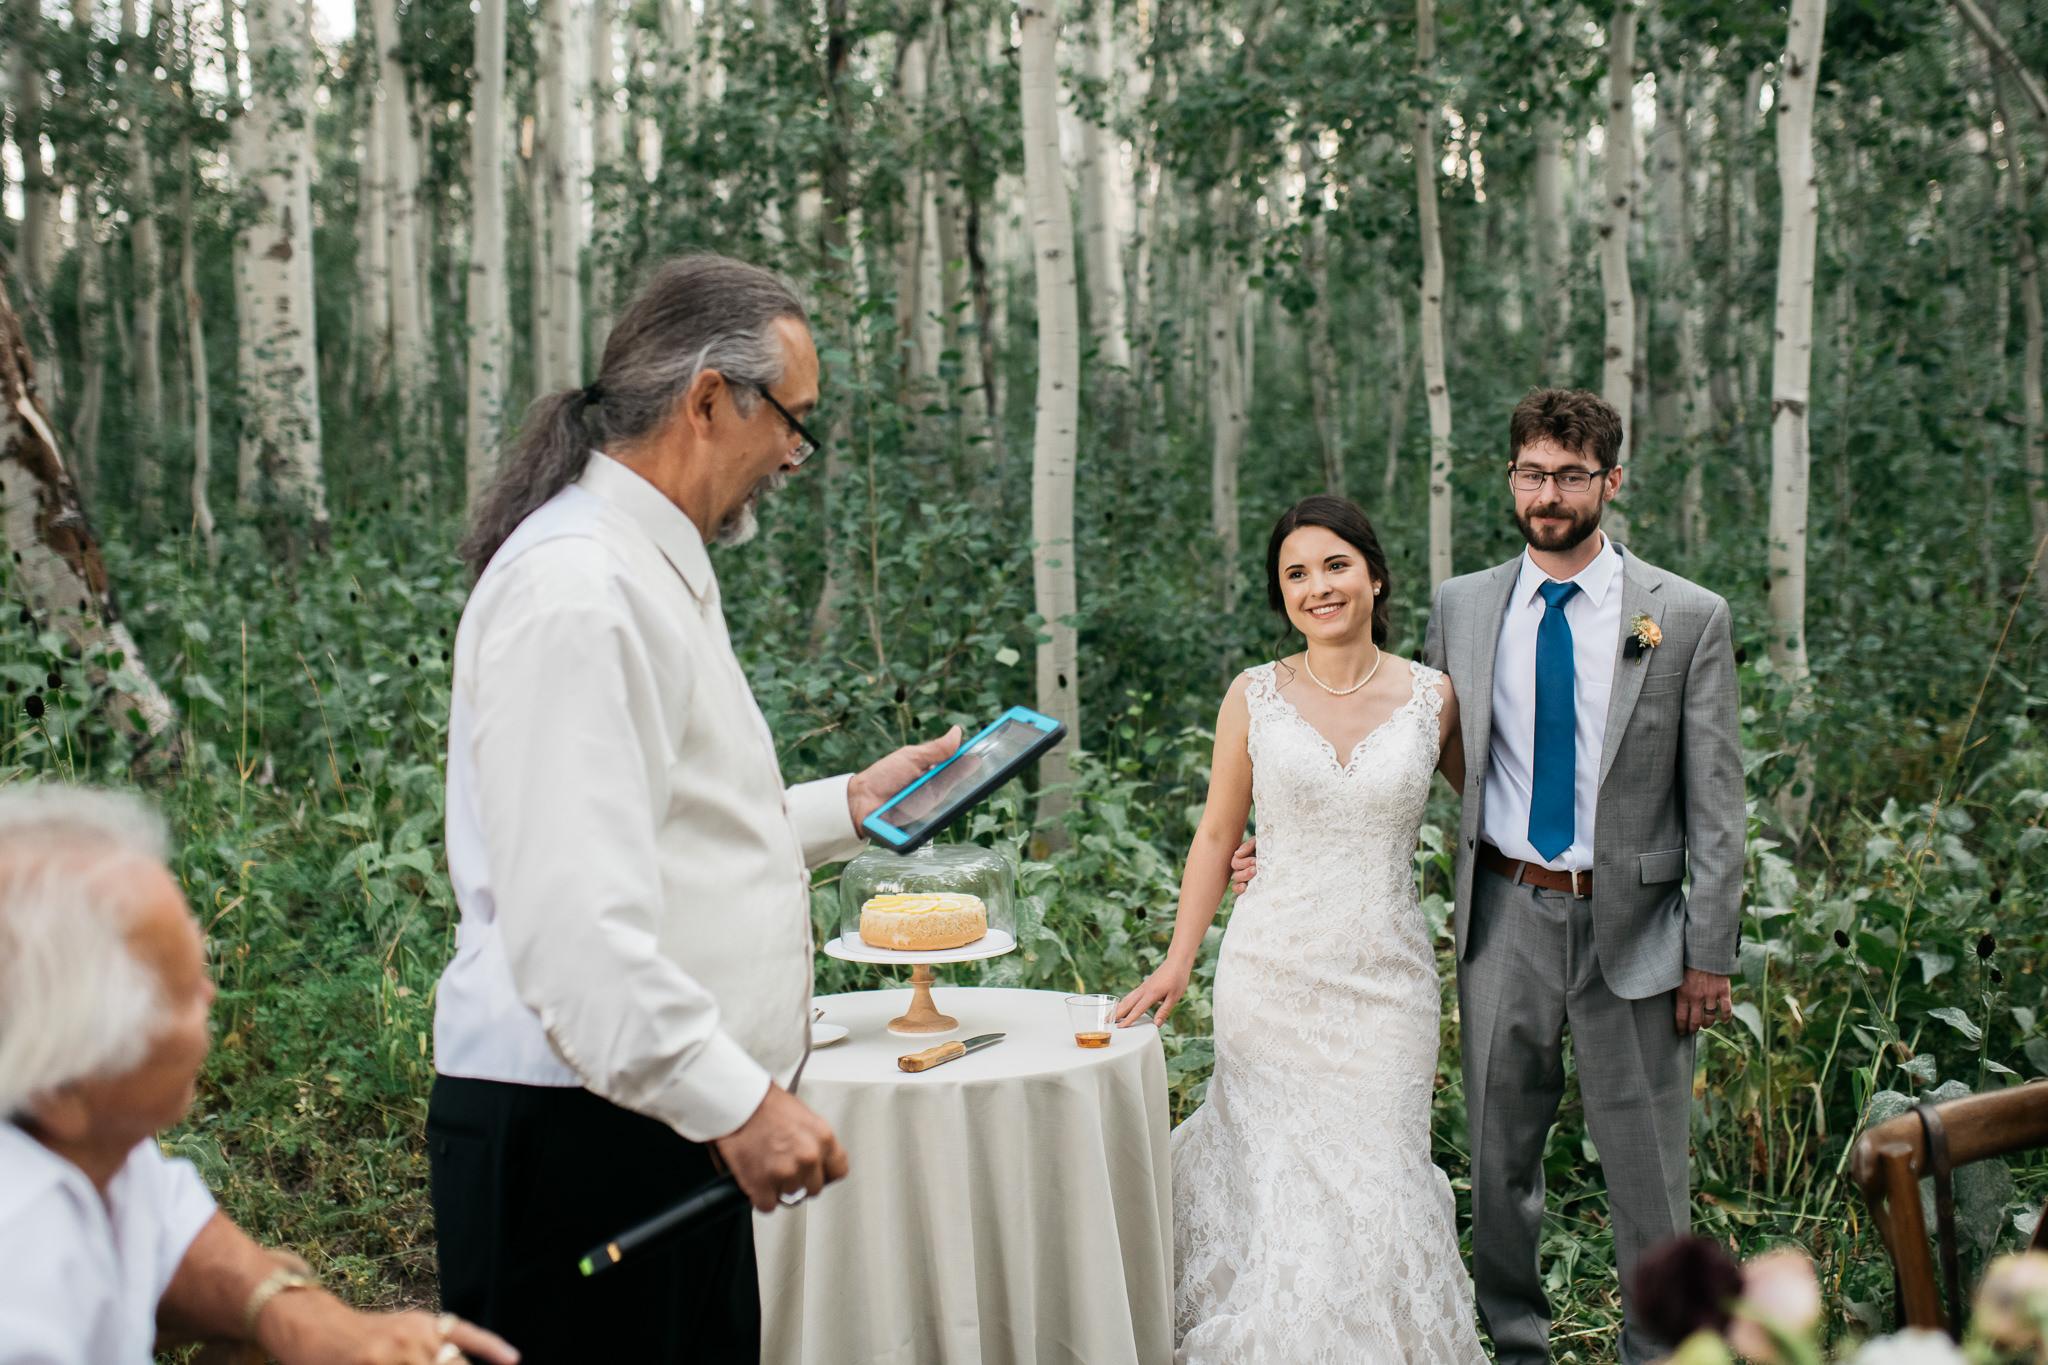 530_ONL_Kat_Nick_Wedding_Trevor_Hooper_Photo.jpg